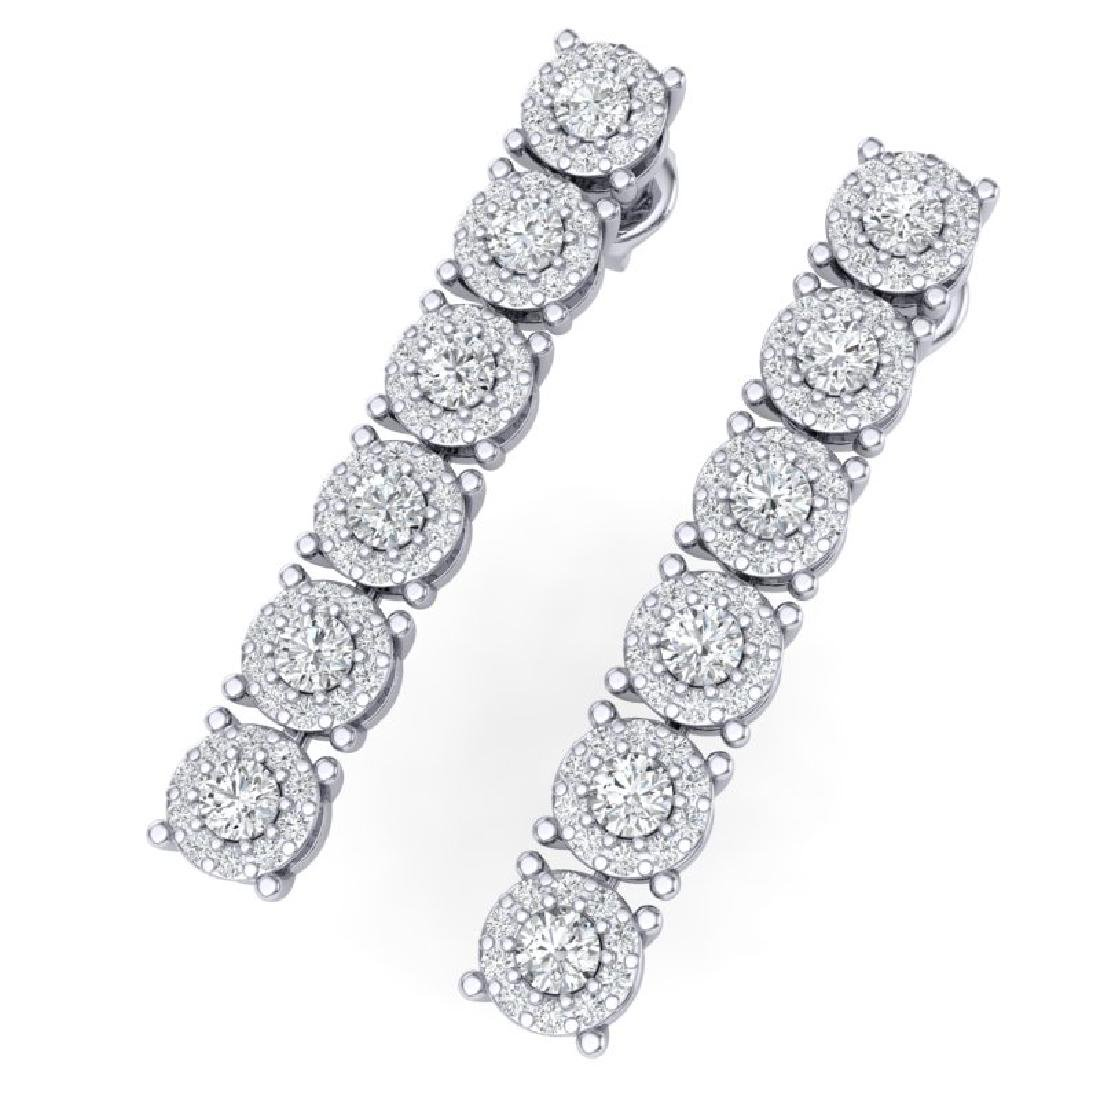 2 CTW Certified SI/I Diamond Halo Earrings 18K White